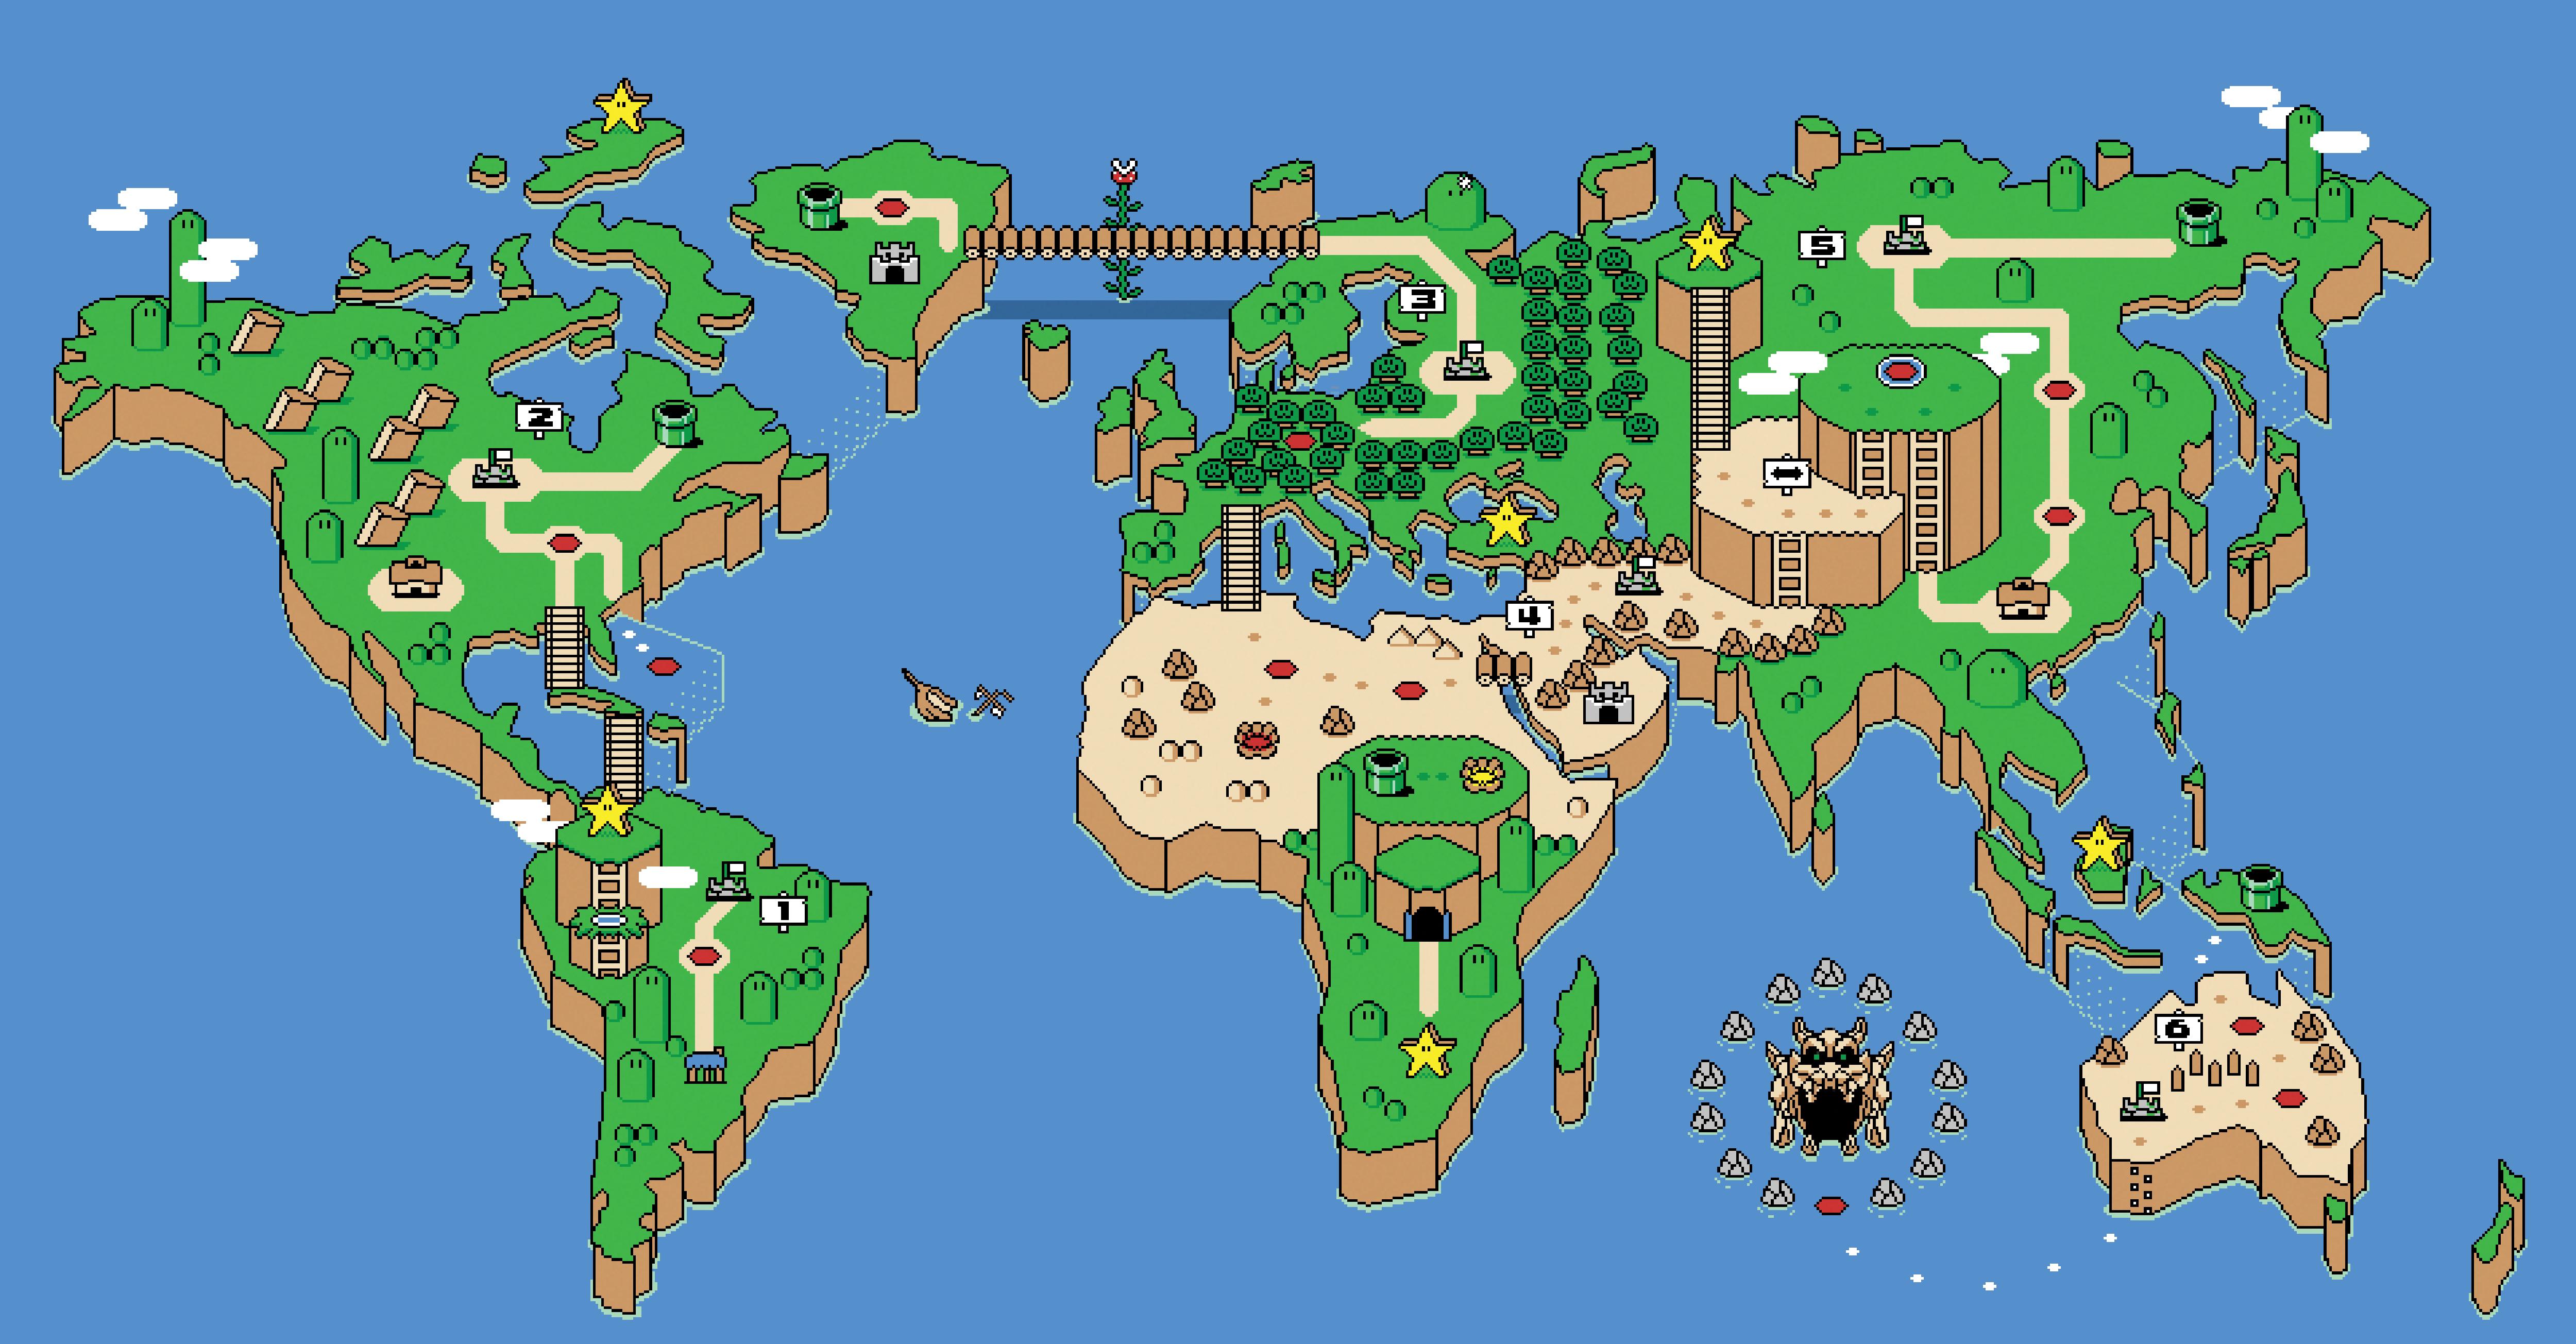 Inspirational Zelda World Map – Bressiemusic on nes world map, hyrule world map, majoras mask world map, pokemon world map, smw world map, spira world map, link's awakening map, fox world map, a link to the past world map, official ffx world map, pewdiepie world map, yoshi's island world map, spirit tracks world map, fallout3 world map, star wars world map, minish cap world map, fire temple ocarina of time map, bomberman world map, spyro world map, gears of war world map,